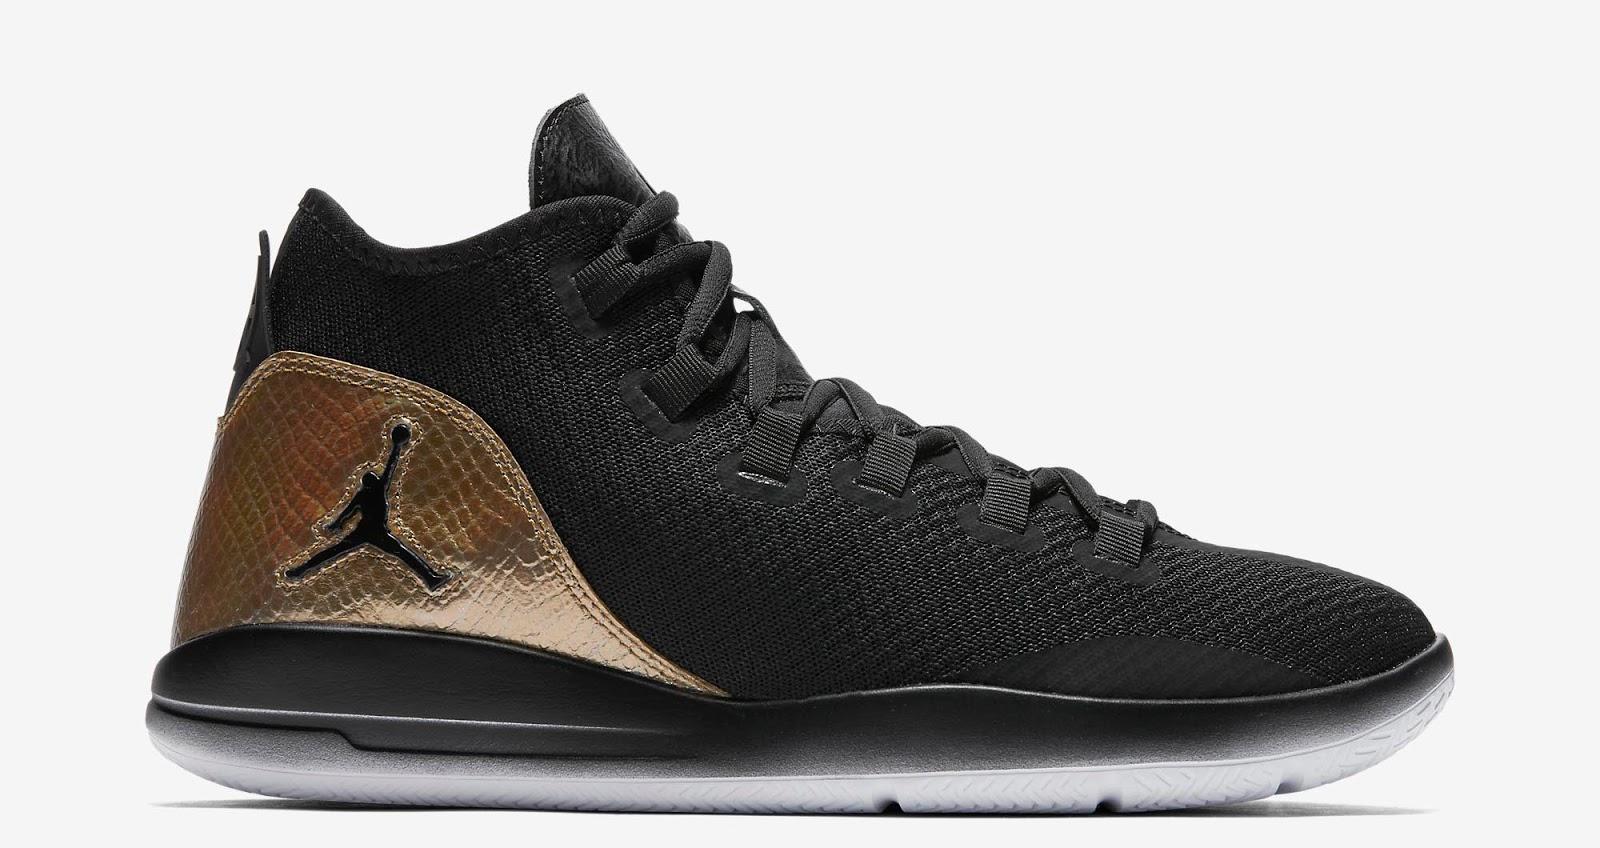 ajordanxi Your  1 Source For Sneaker Release Dates  Jordan Reveal ... 26253433a